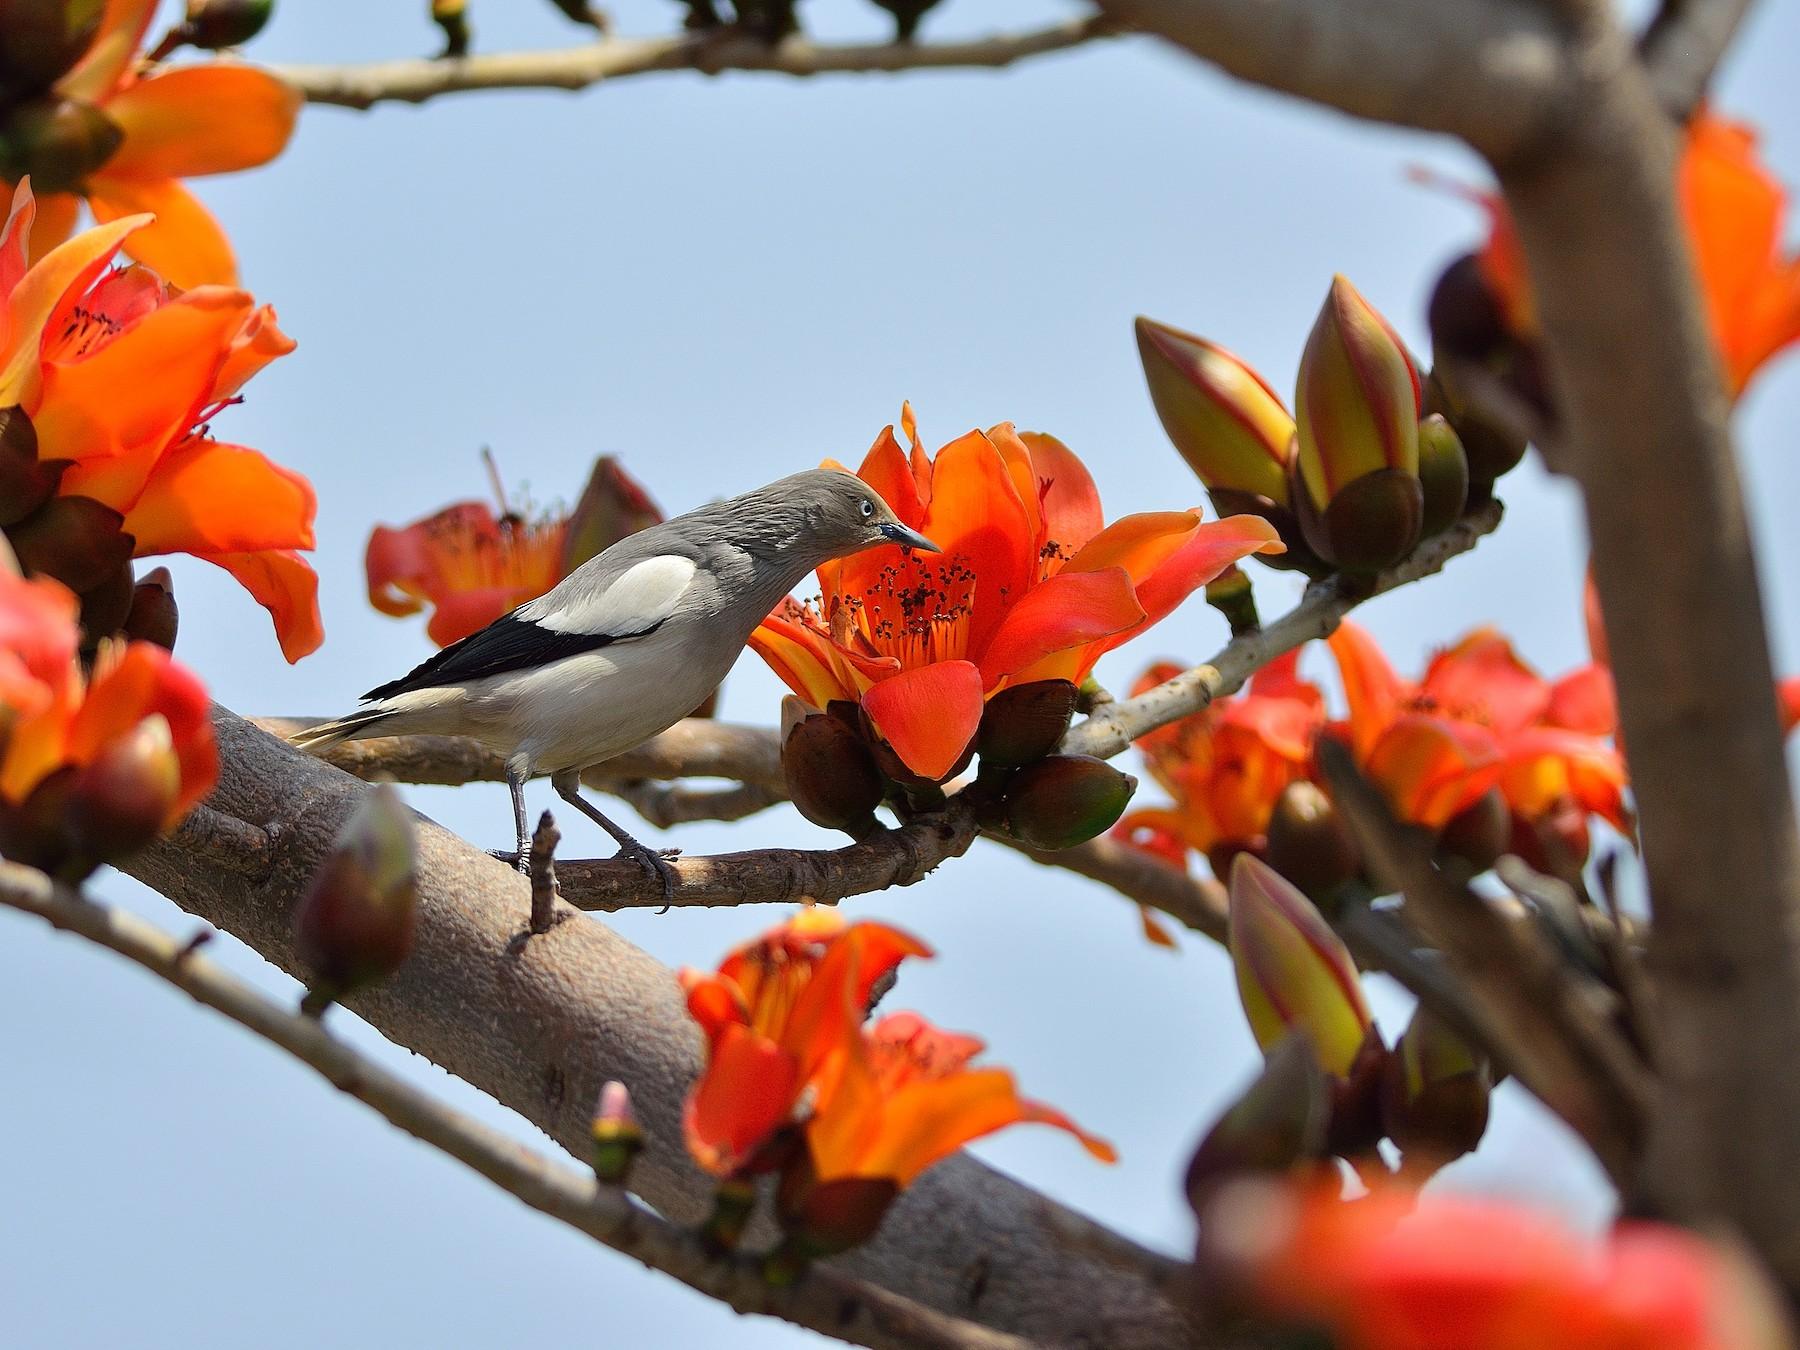 White-shouldered Starling - Wbird Tsai